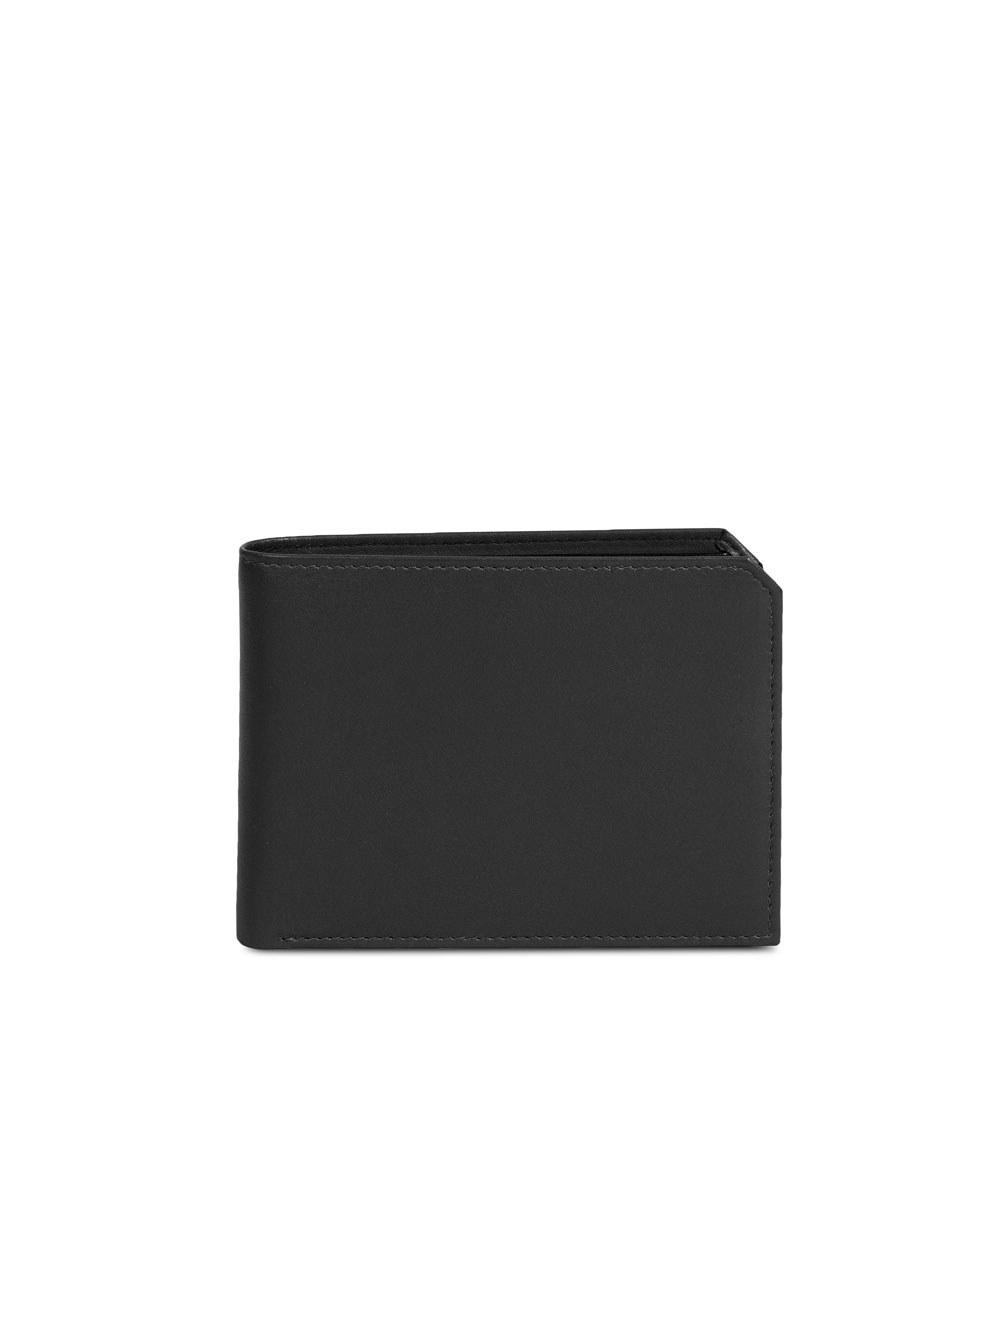 Classic Wallet - Black